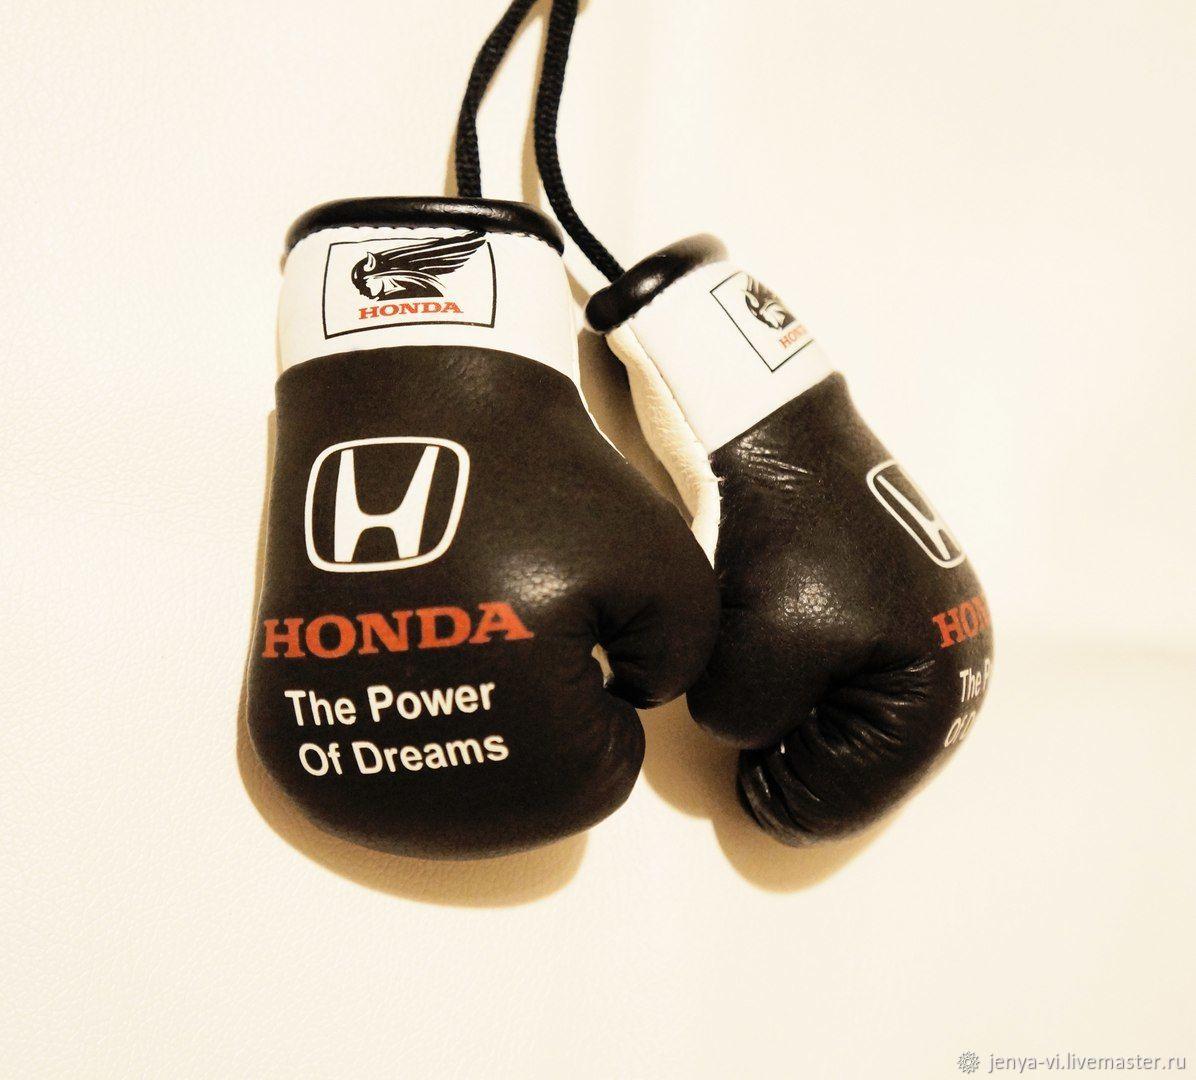 фото боксерских рукавичек прямо